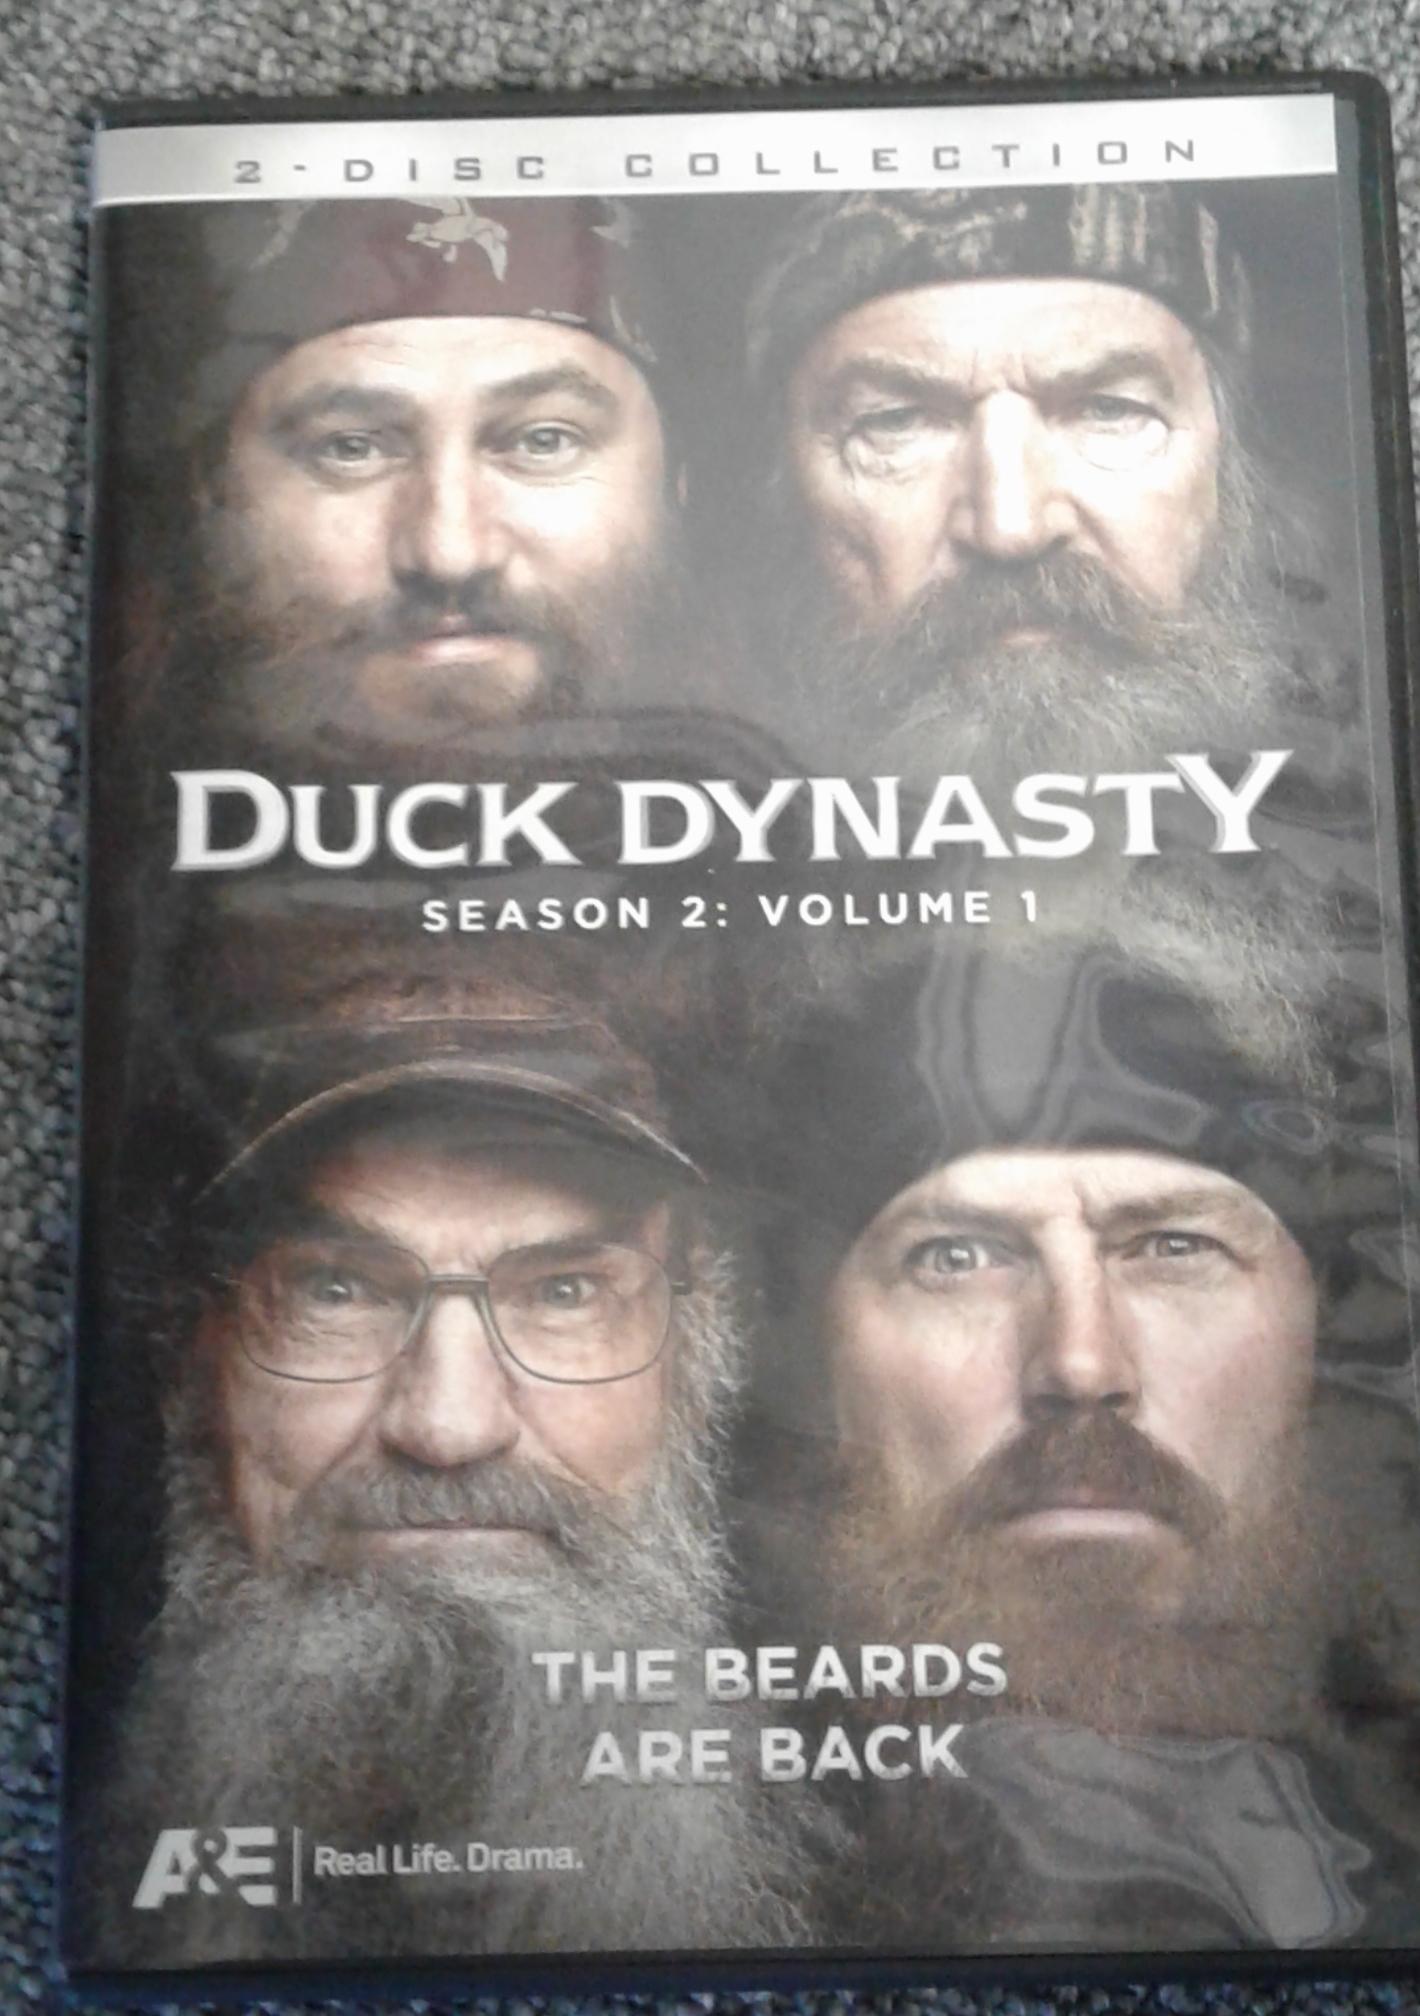 DUCK DYNASTY SEASON 2: VOLUME 1